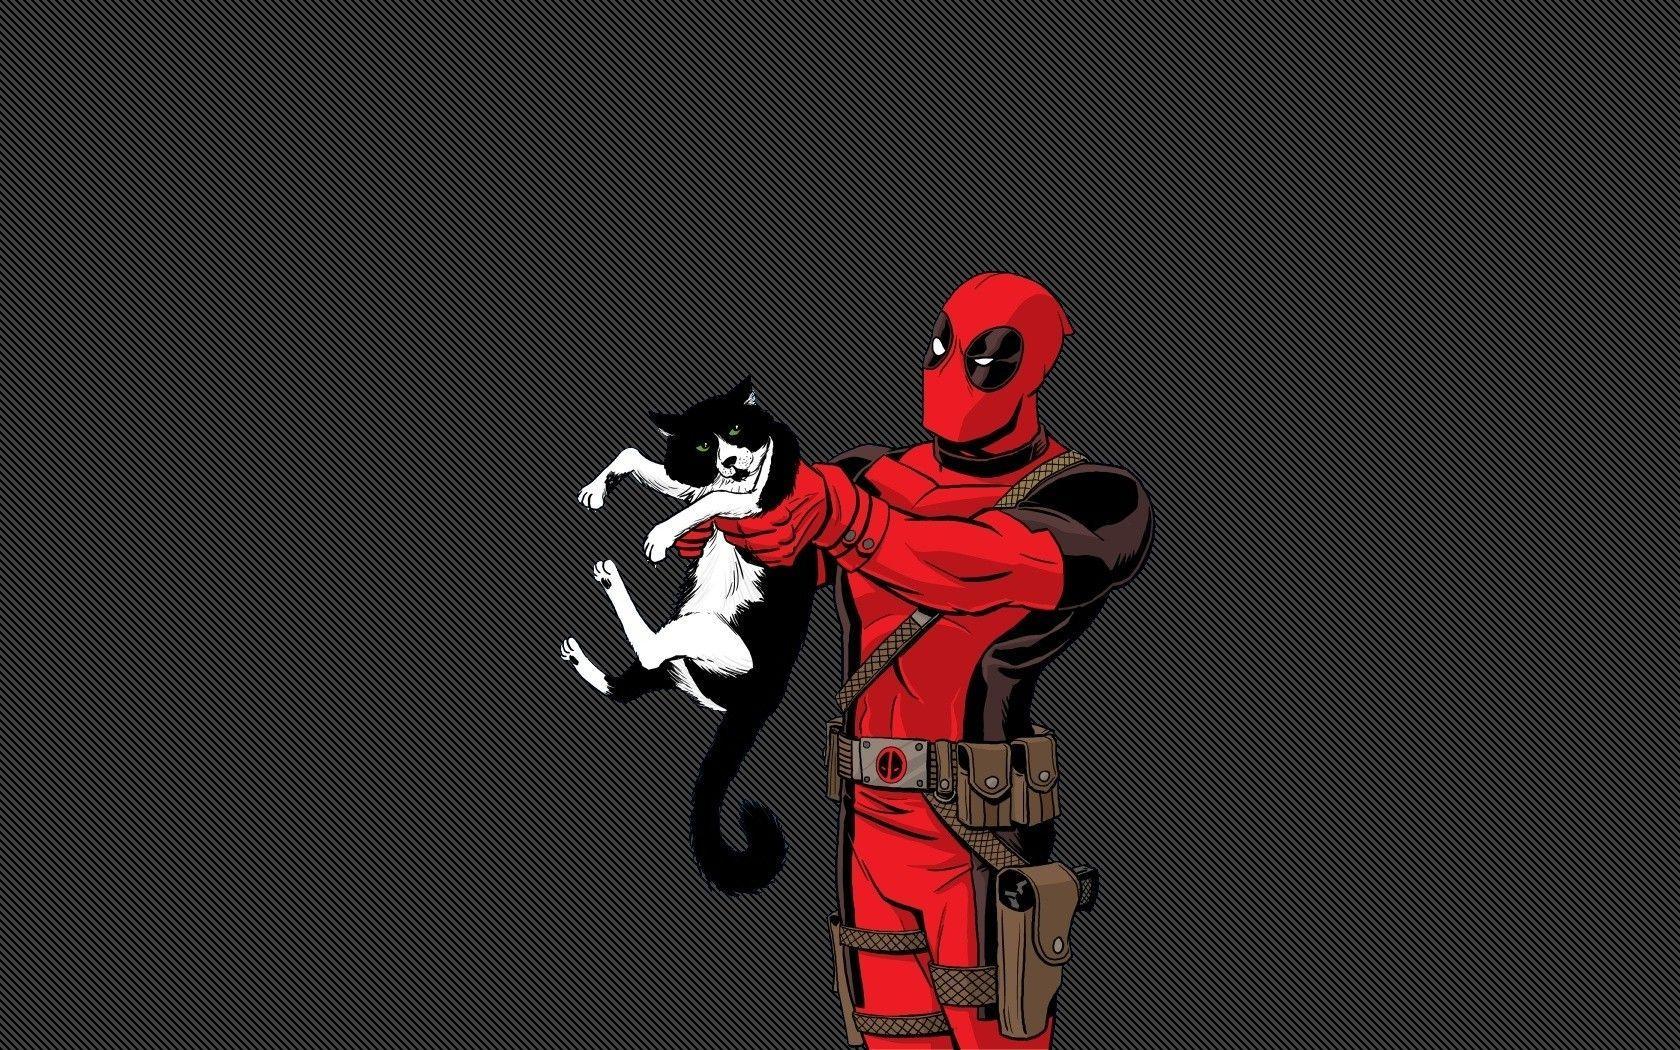 Deadpool Smartphone Wallpapers Top Free Deadpool Smartphone